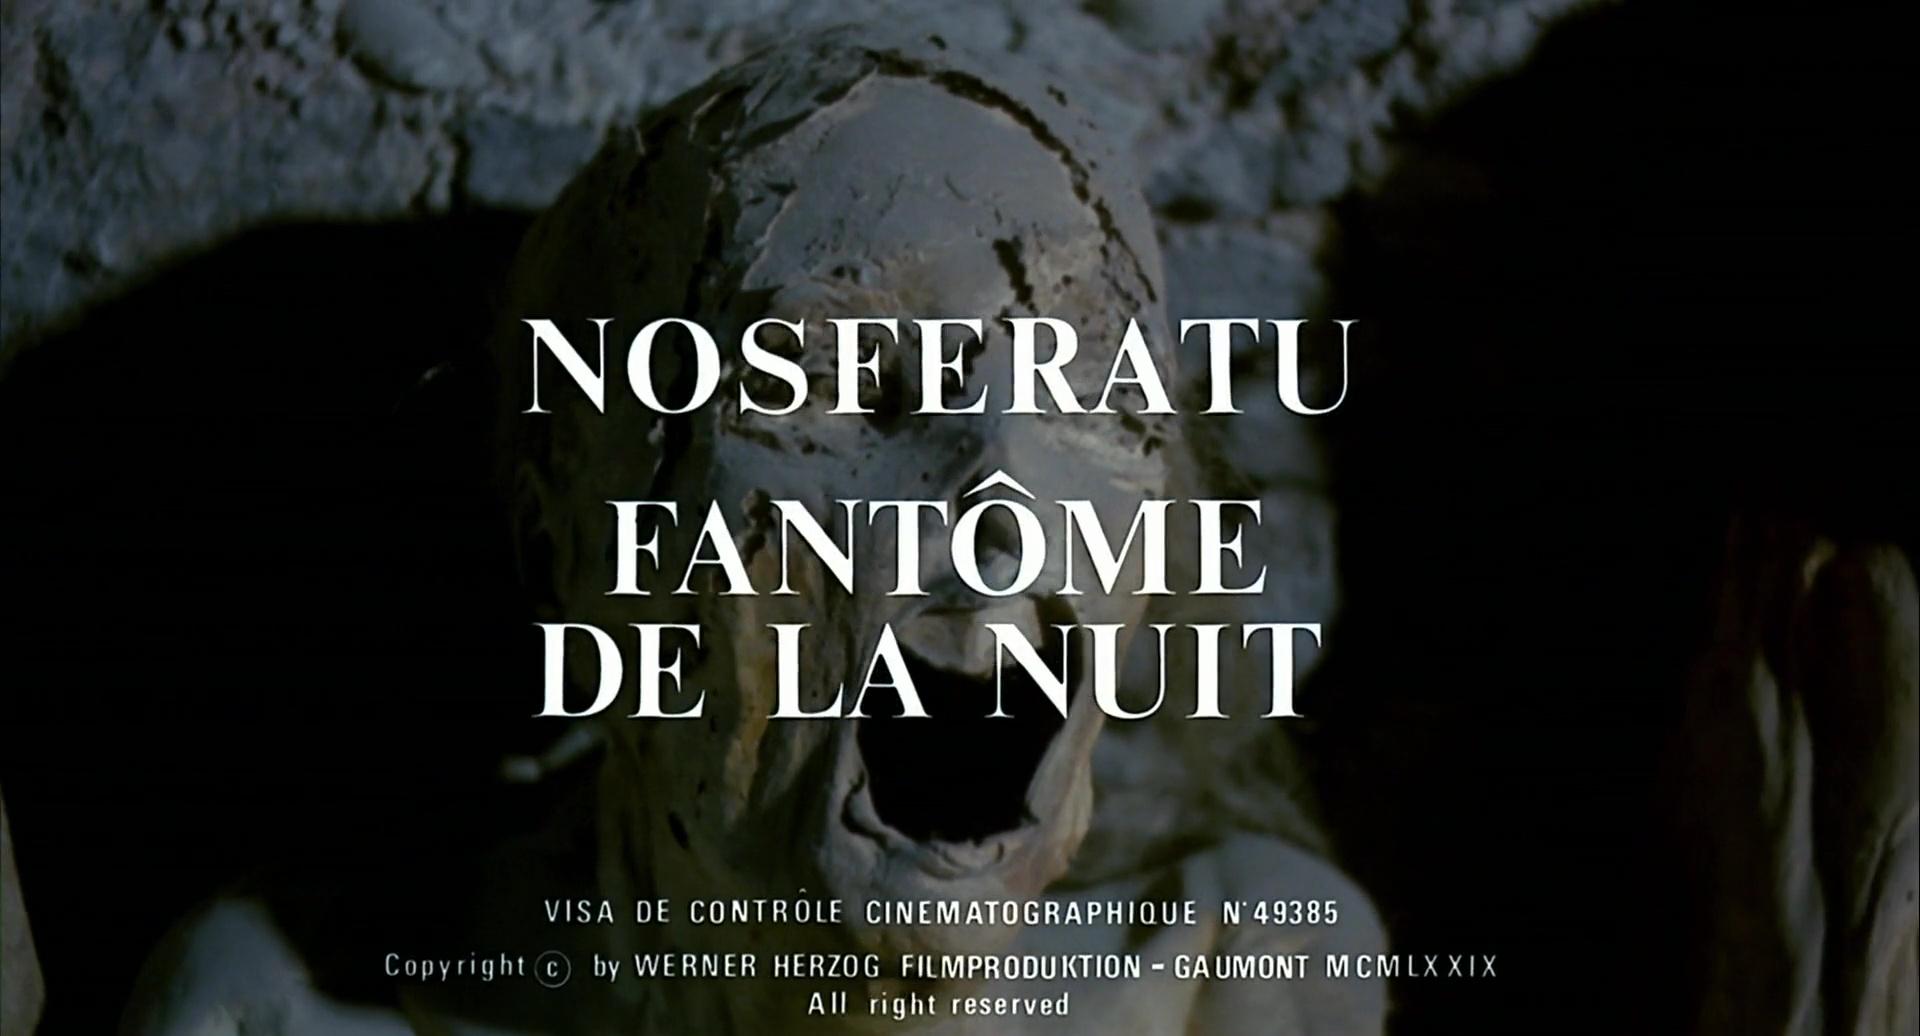 NOSFERATU, FANTÔME DE LA NUIT (Nosferatu Phantom Der Nacht) de Werner Herzog (1979)